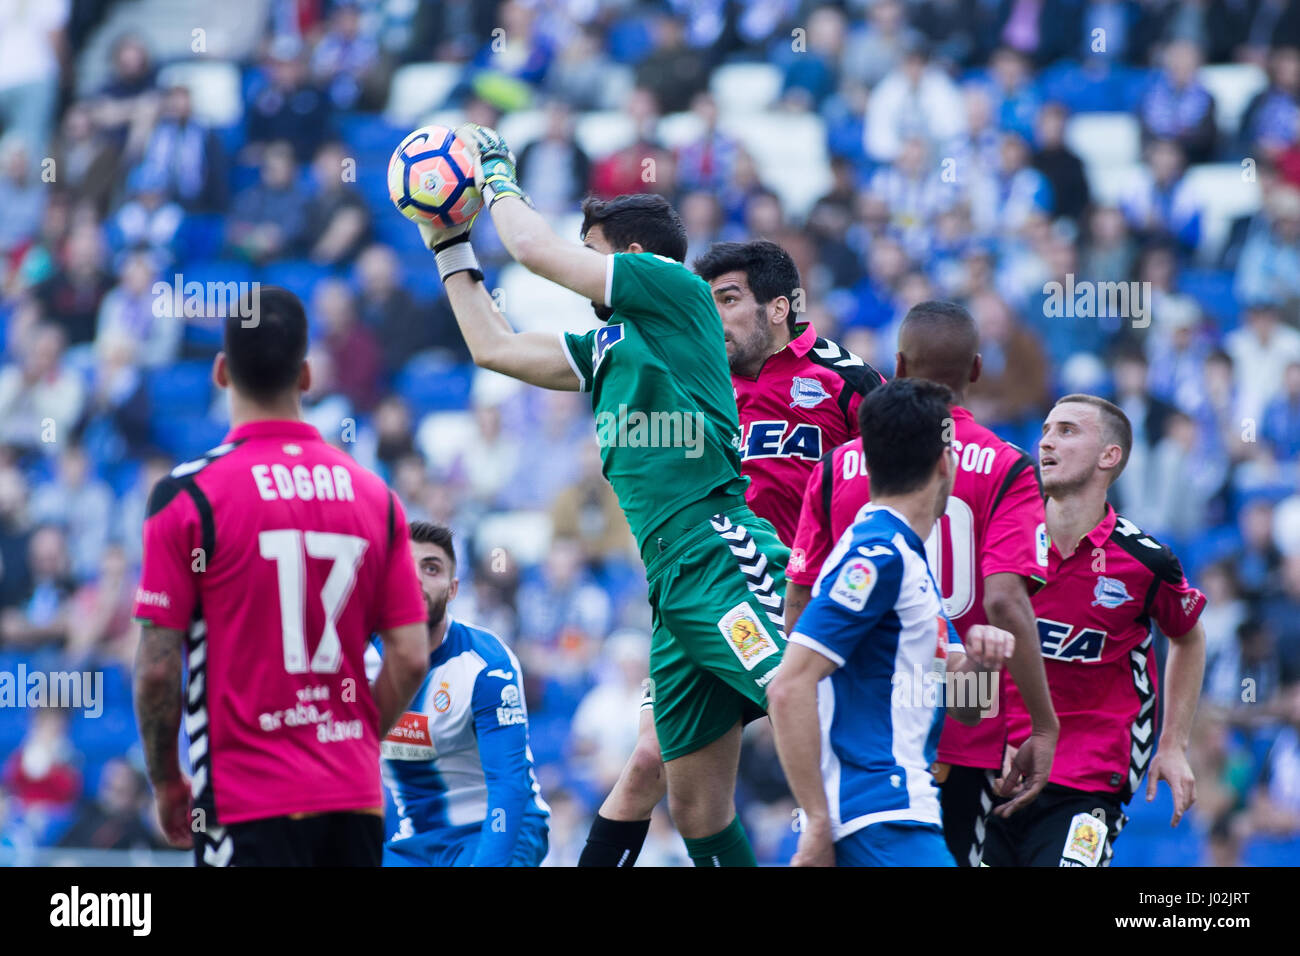 Barcelona, Spain. 8th April, 2017. Pacheco stop the ball during La Liga Santander matchday 31 game between Espanyol - Stock Image